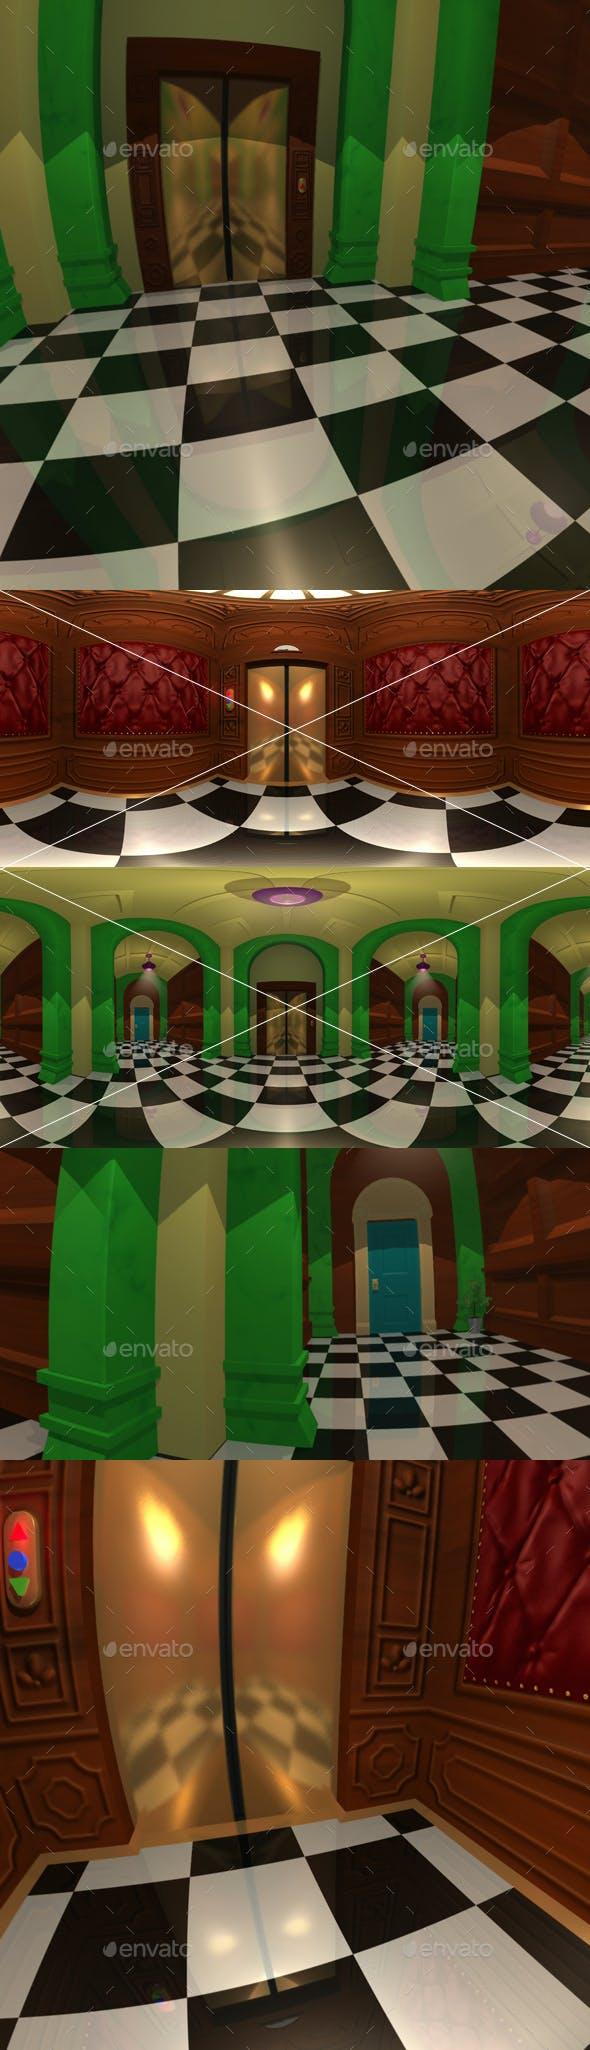 Cartoon Hallway and Elevator HDRI - 3DOcean Item for Sale